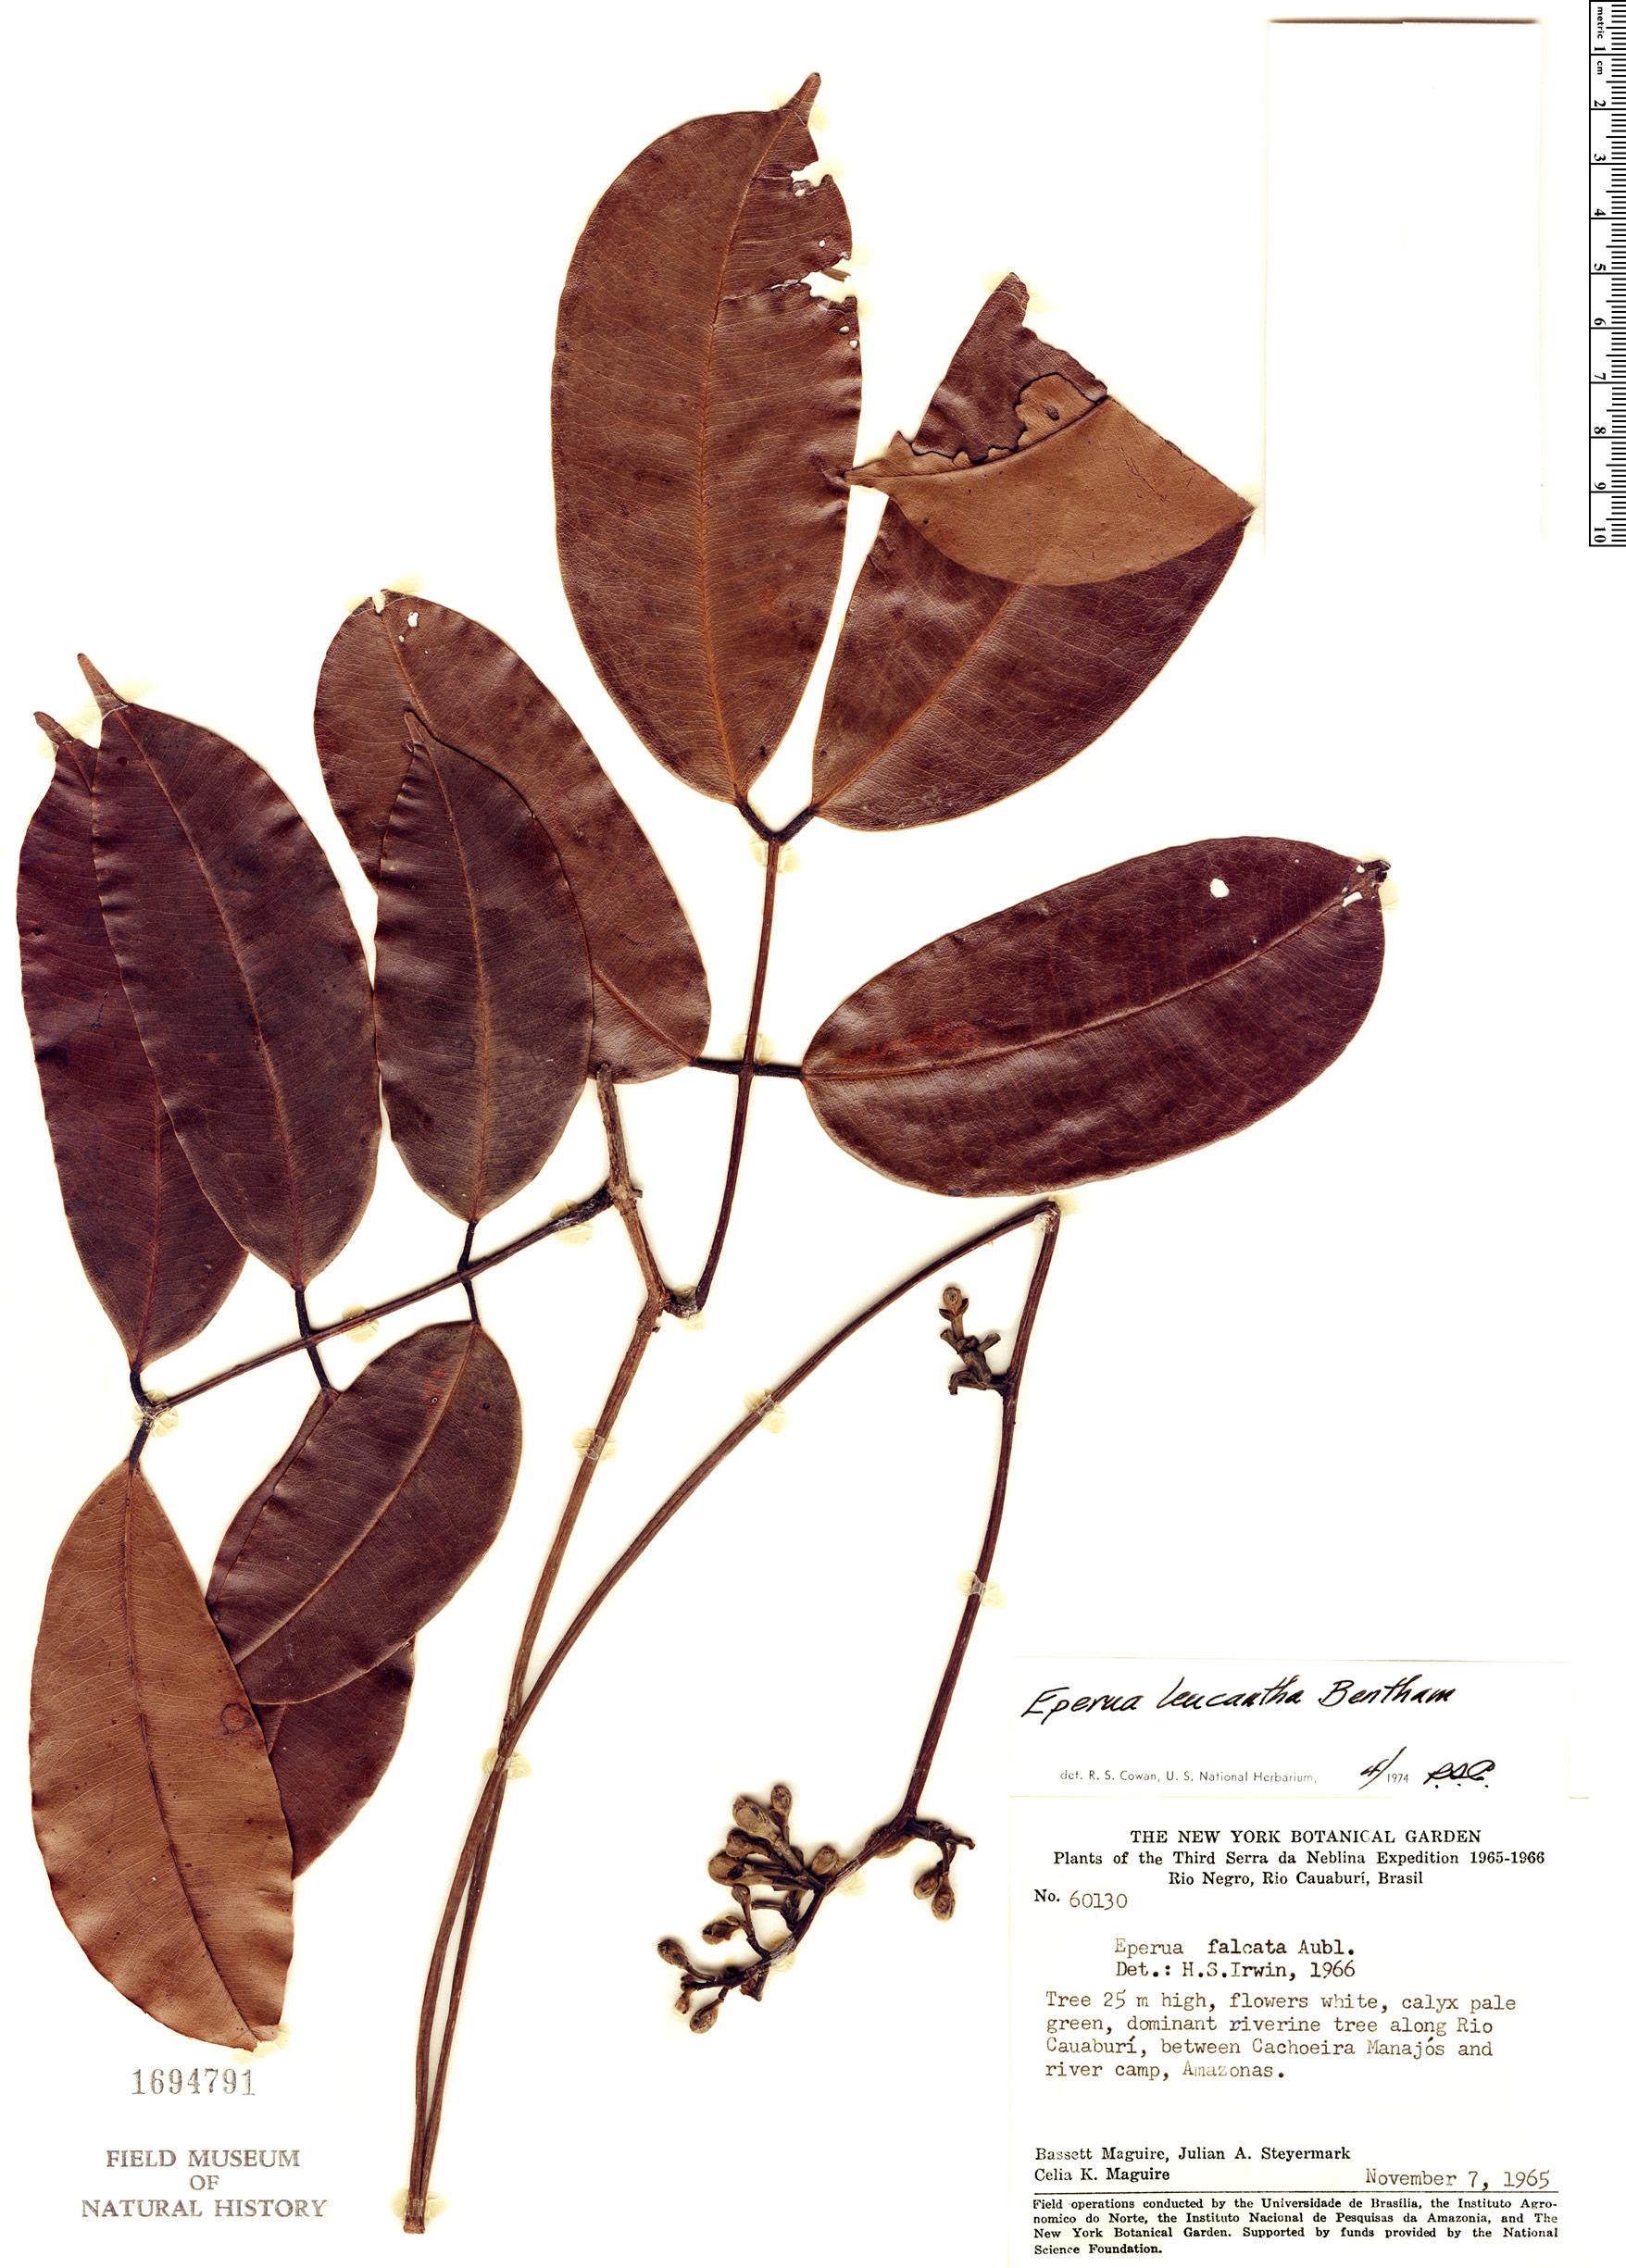 Specimen: Eperua leucantha